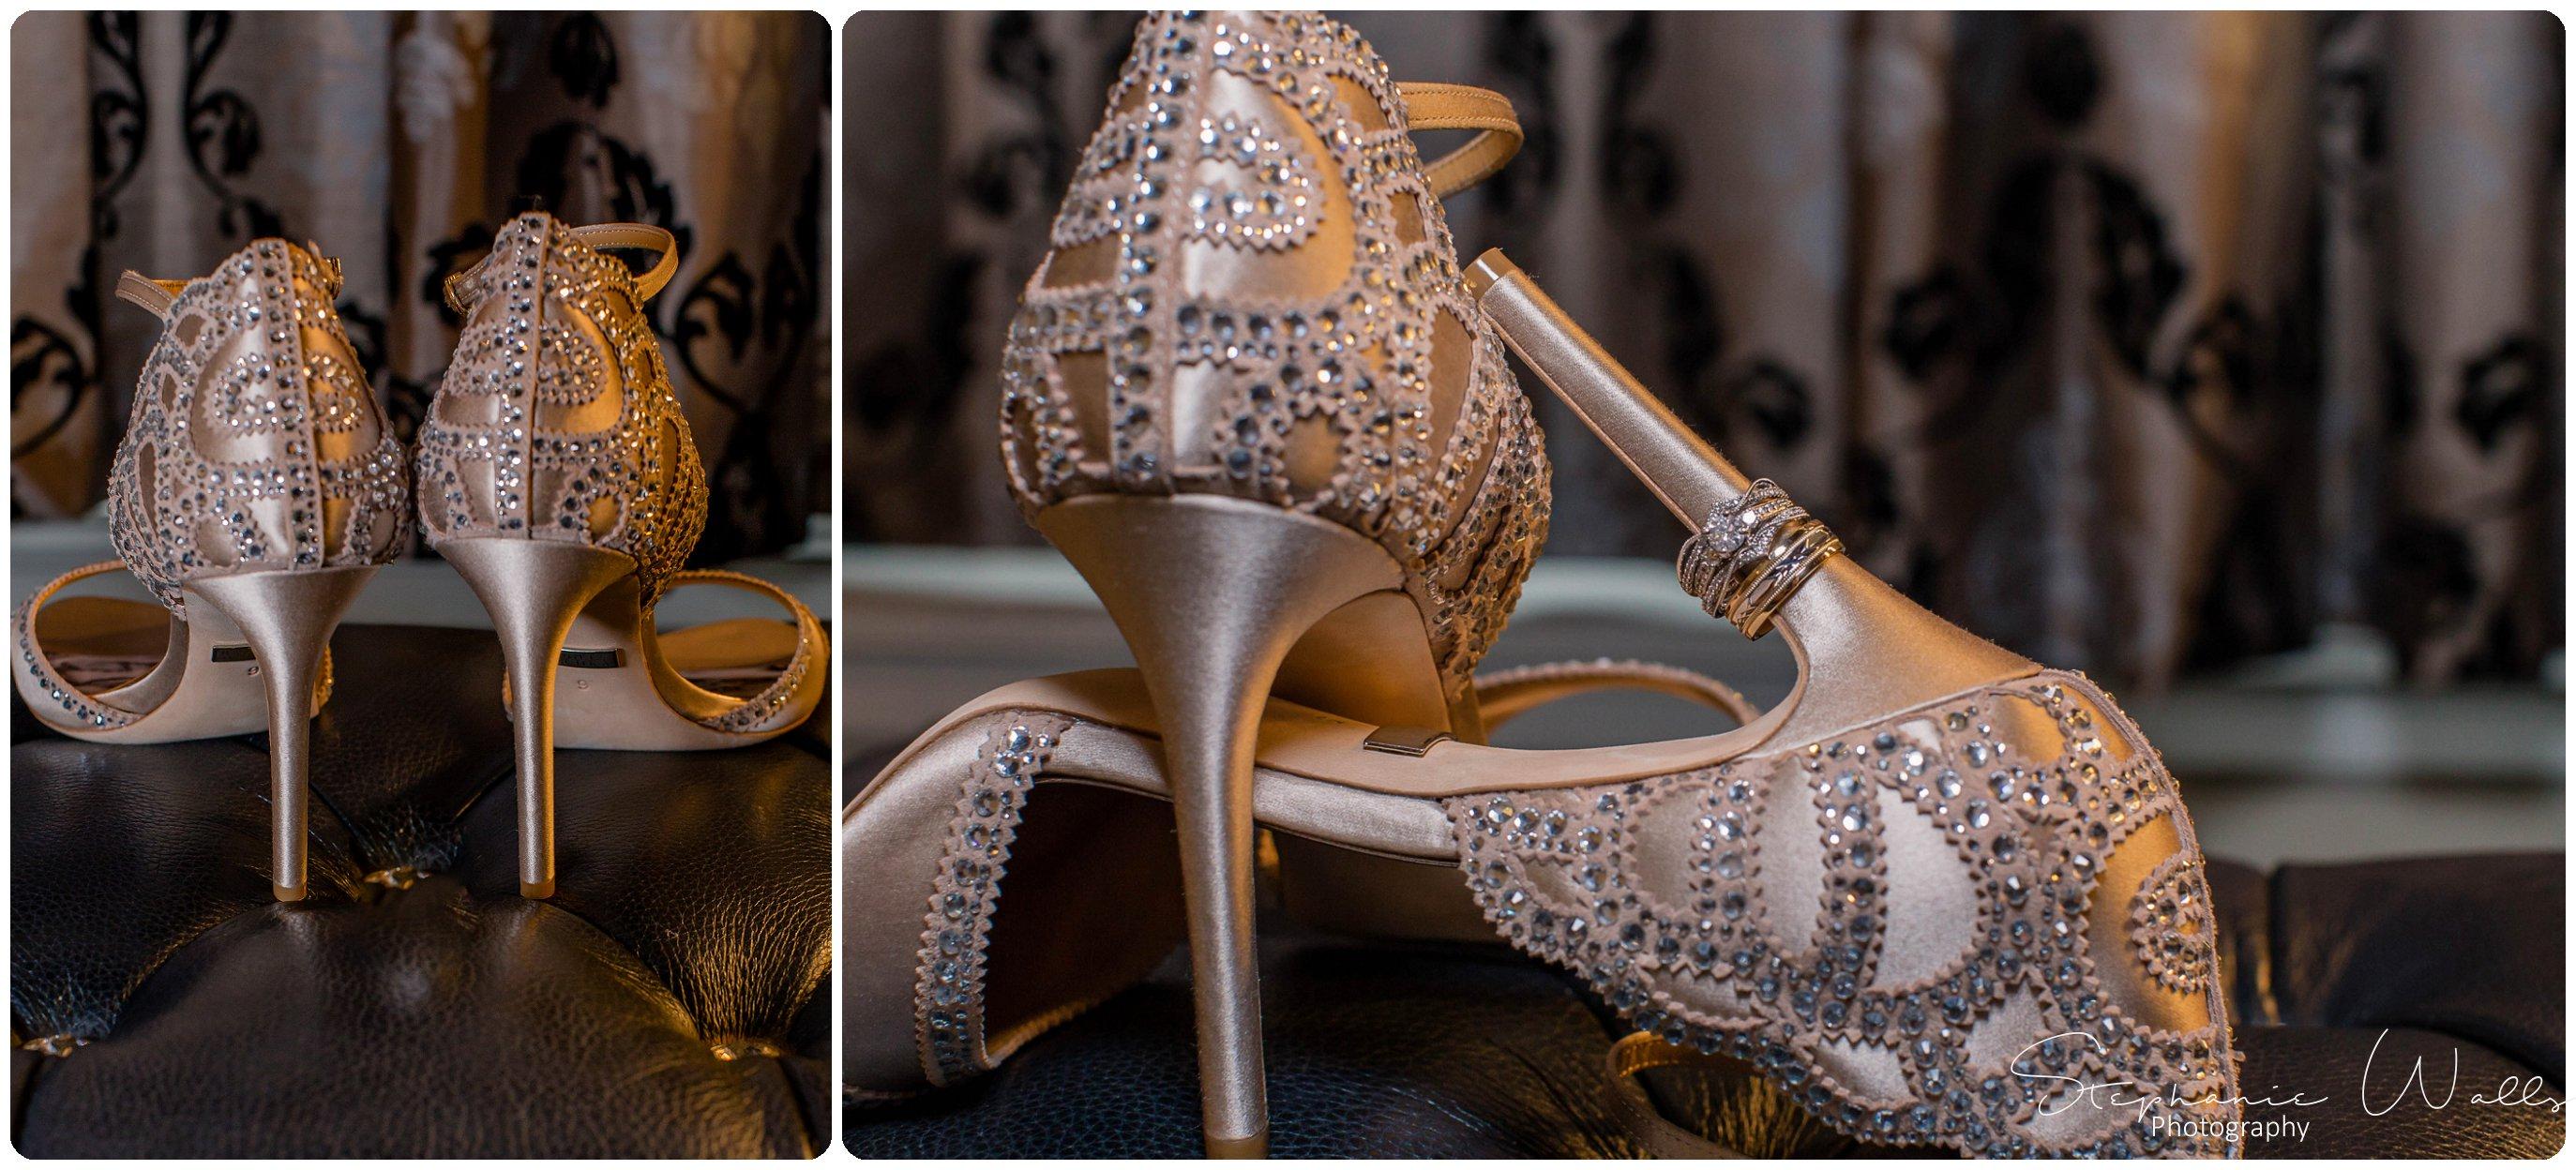 Sears Details 082 The Hero & The Starlet | Monte Cristo Ballroom | Stephanie Walls Photography Weddings